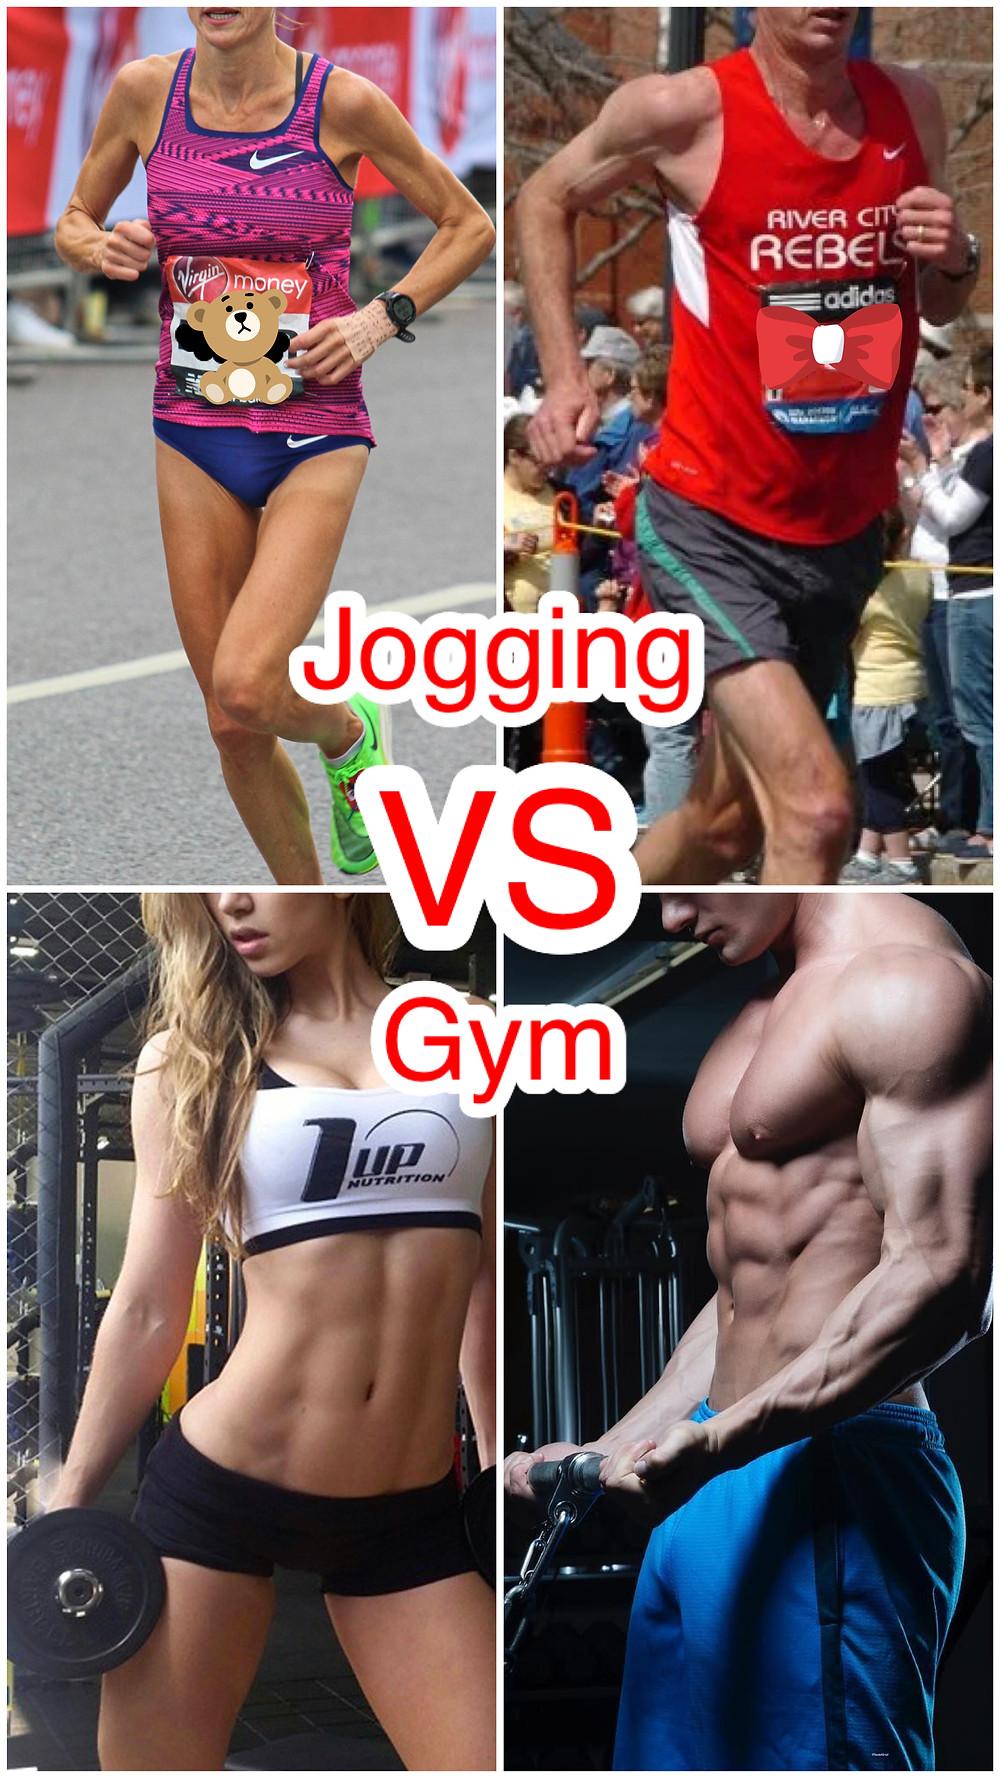 Jogging vs gym body shapes